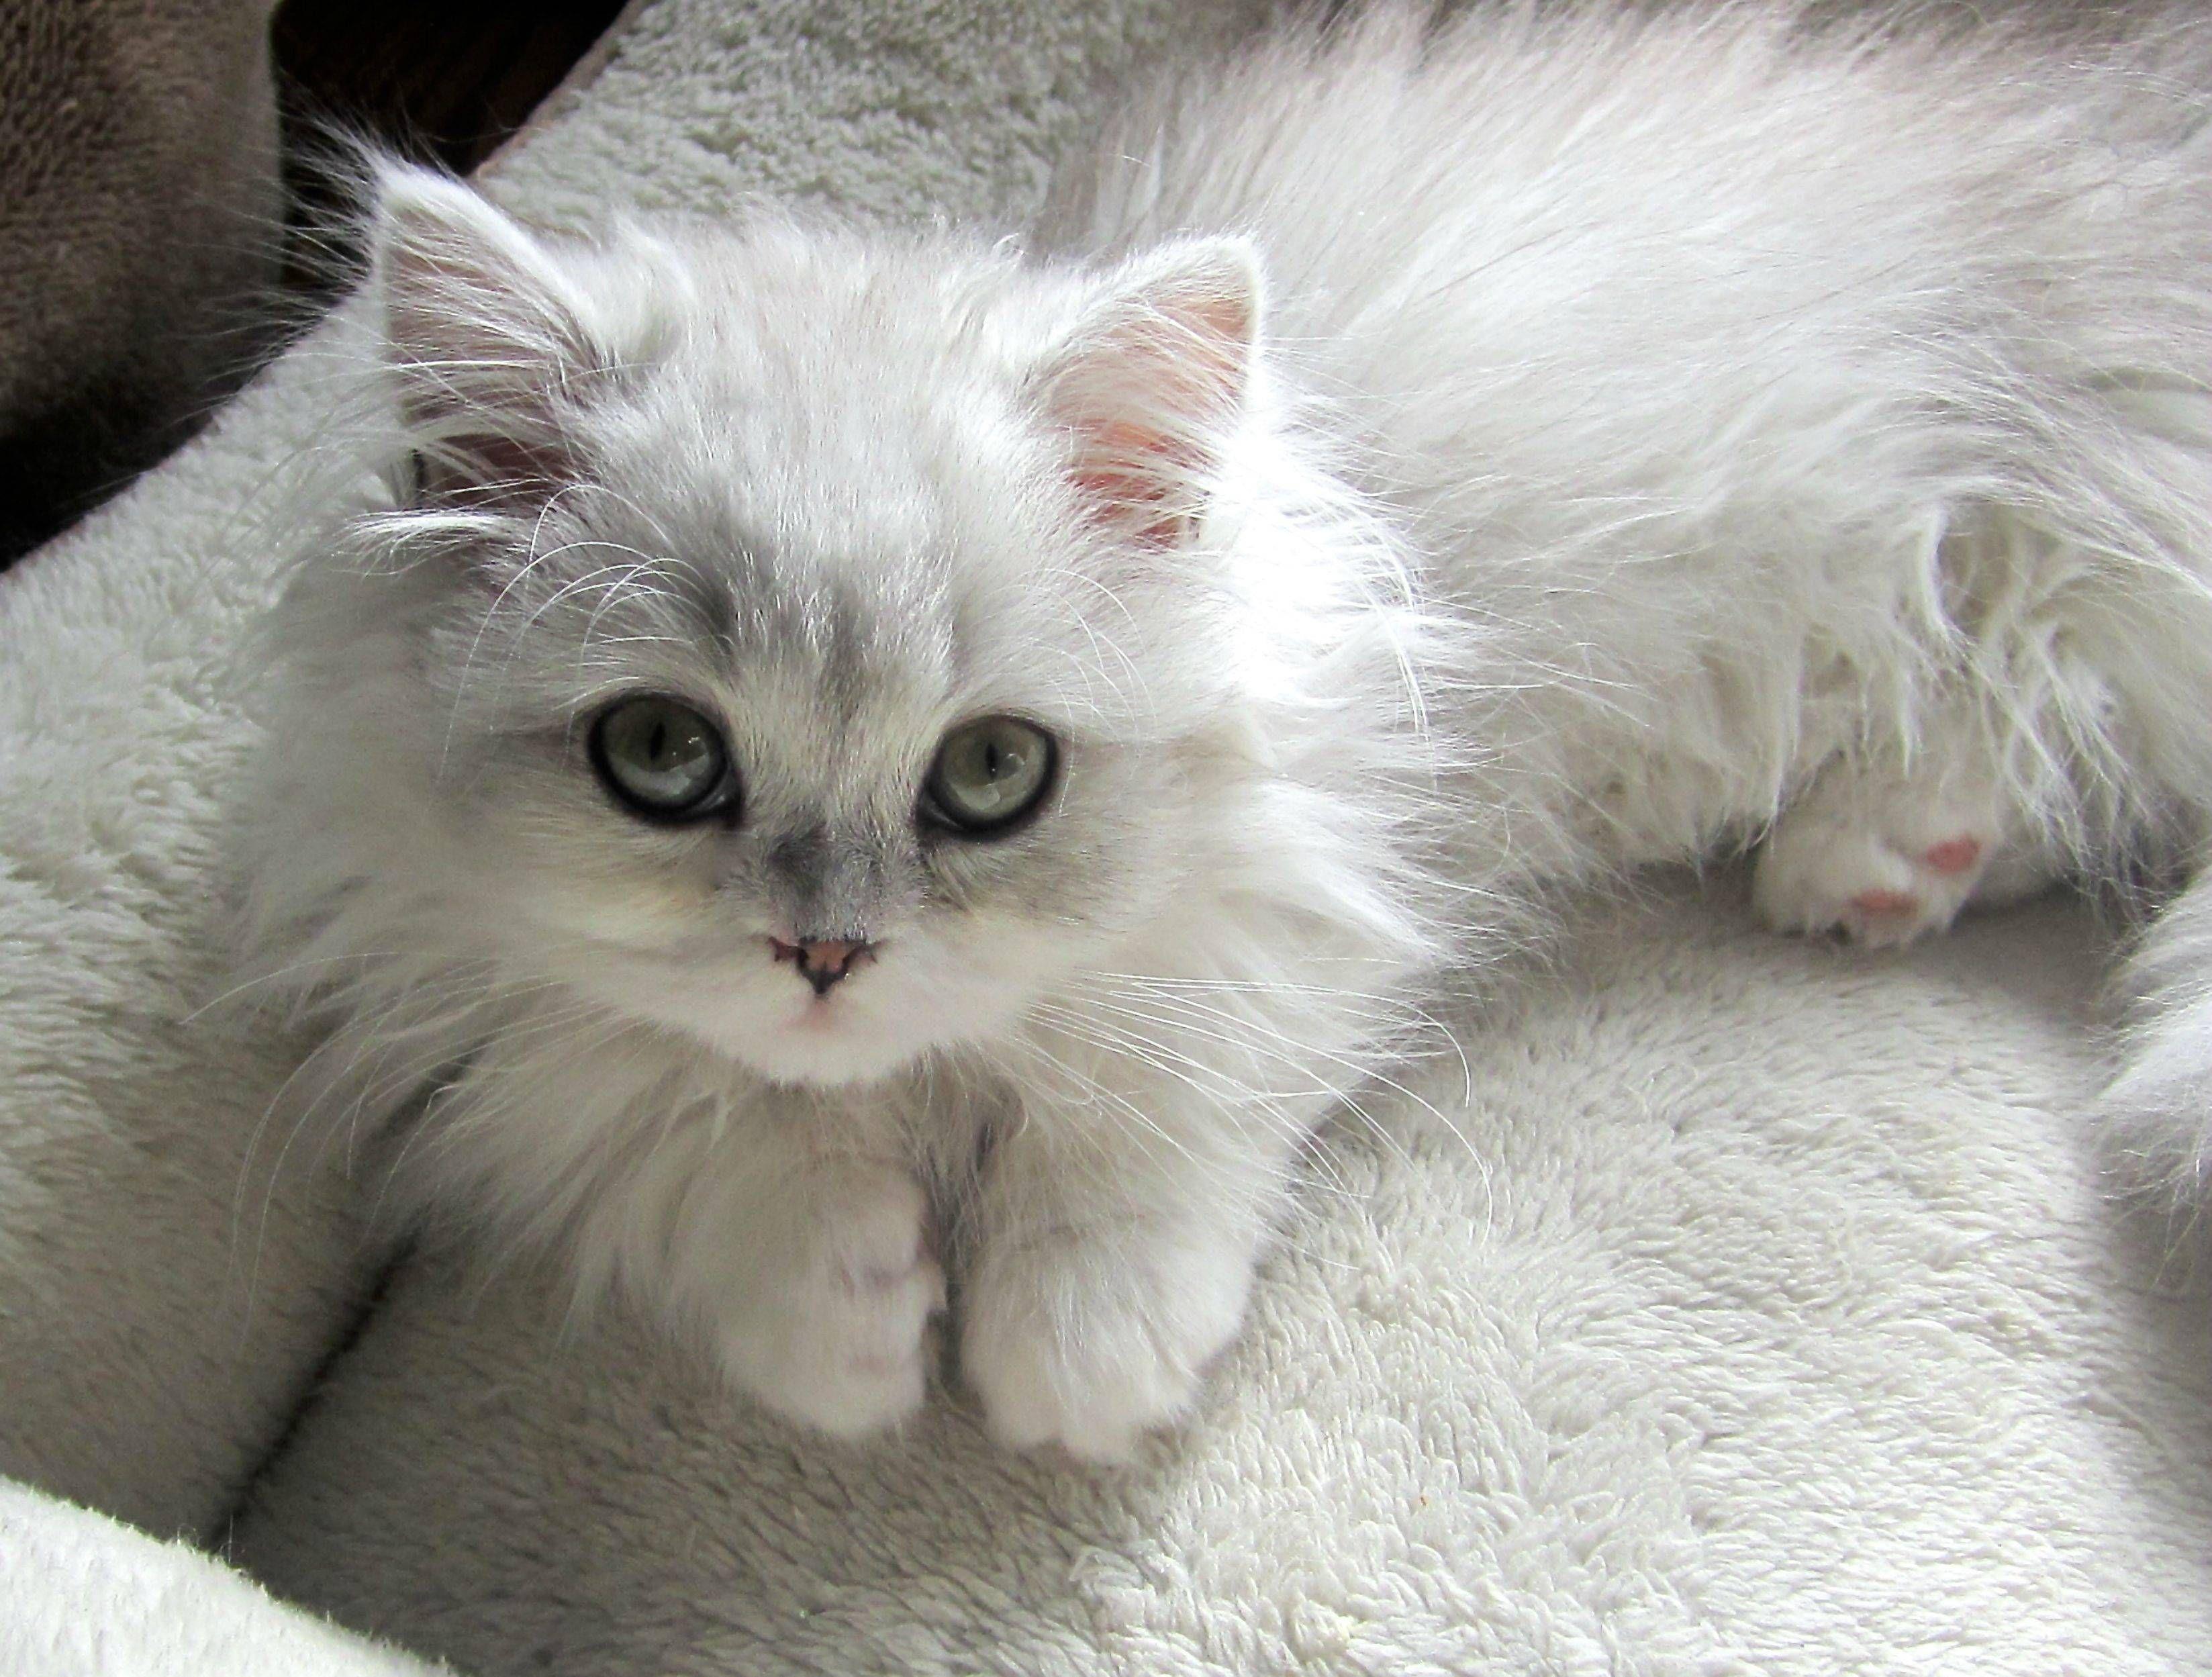 Fluffy Kittens uncaptionedgliW150ef2bd80e370.jpeg